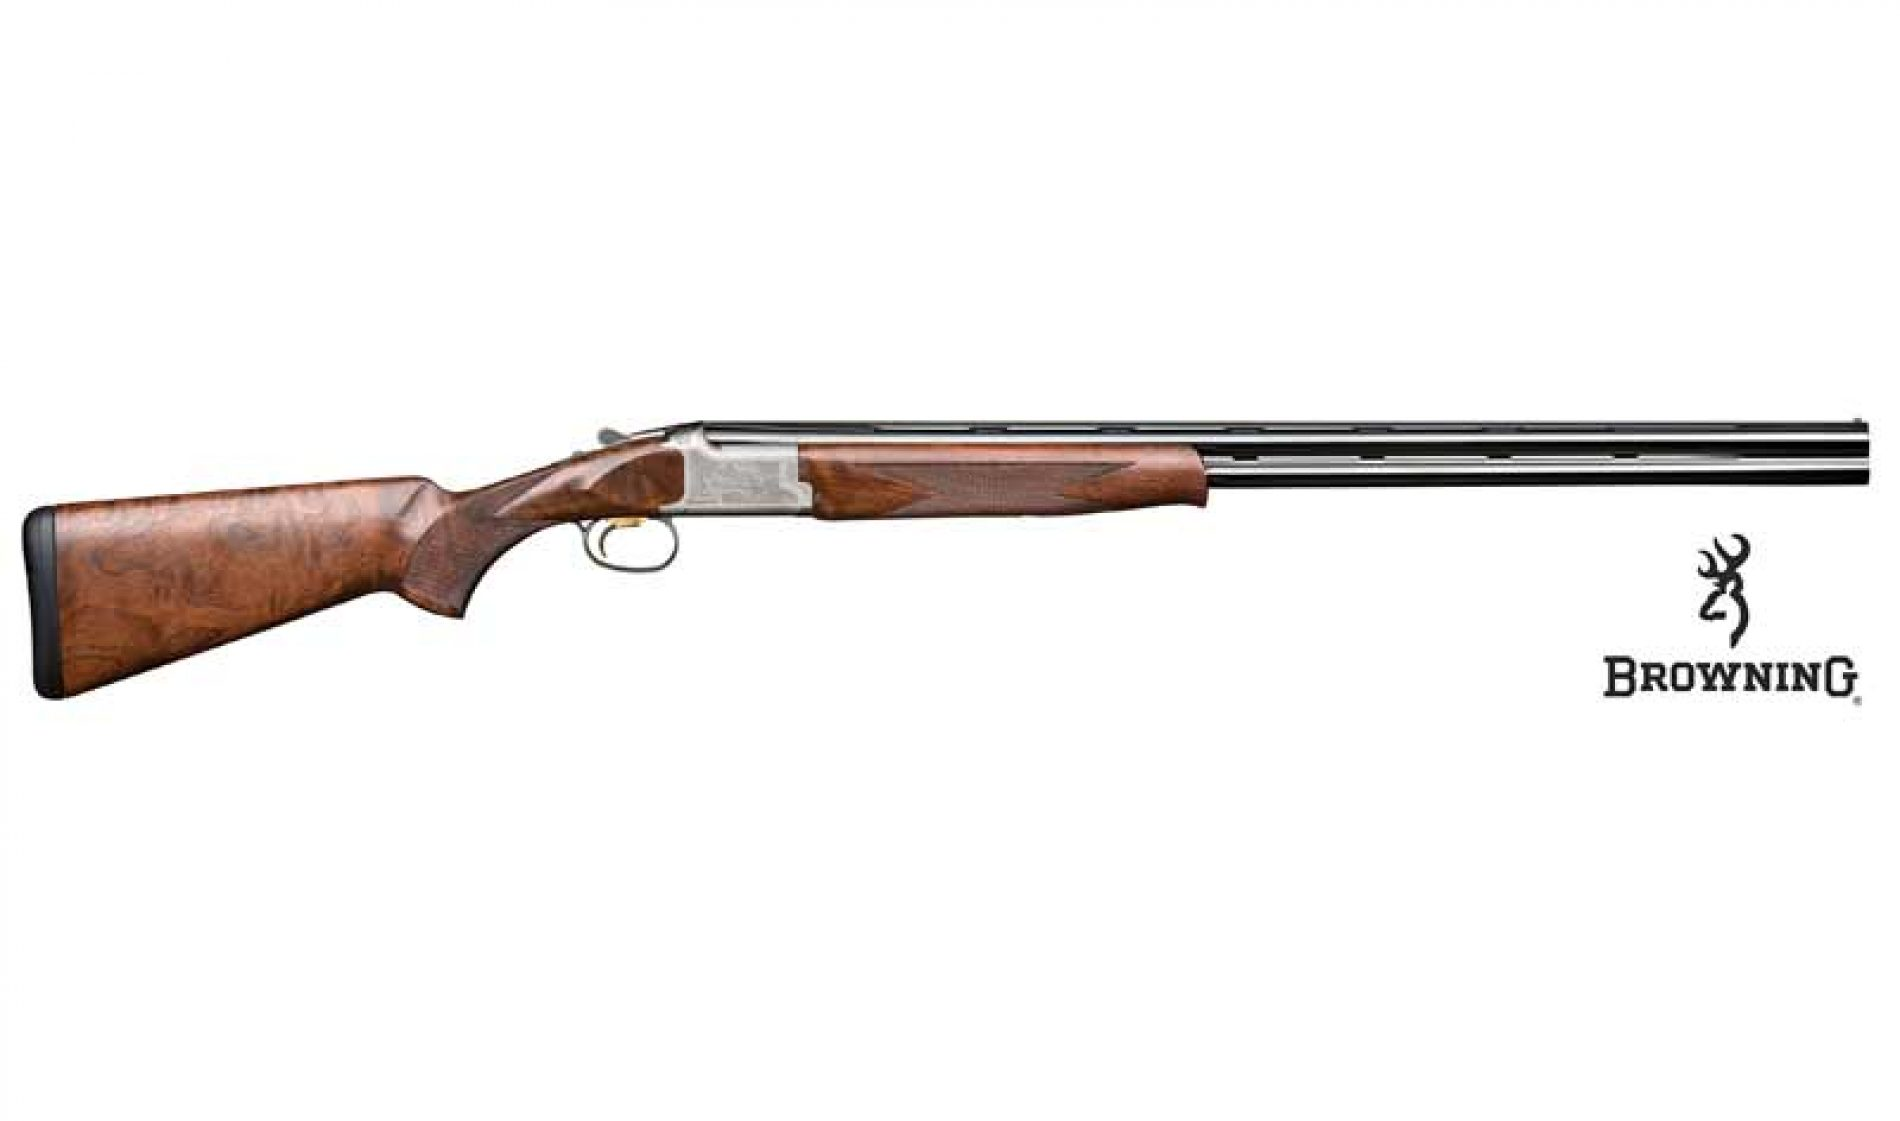 Nueva escopeta Superpuesta B525 Sporter One calibre 20